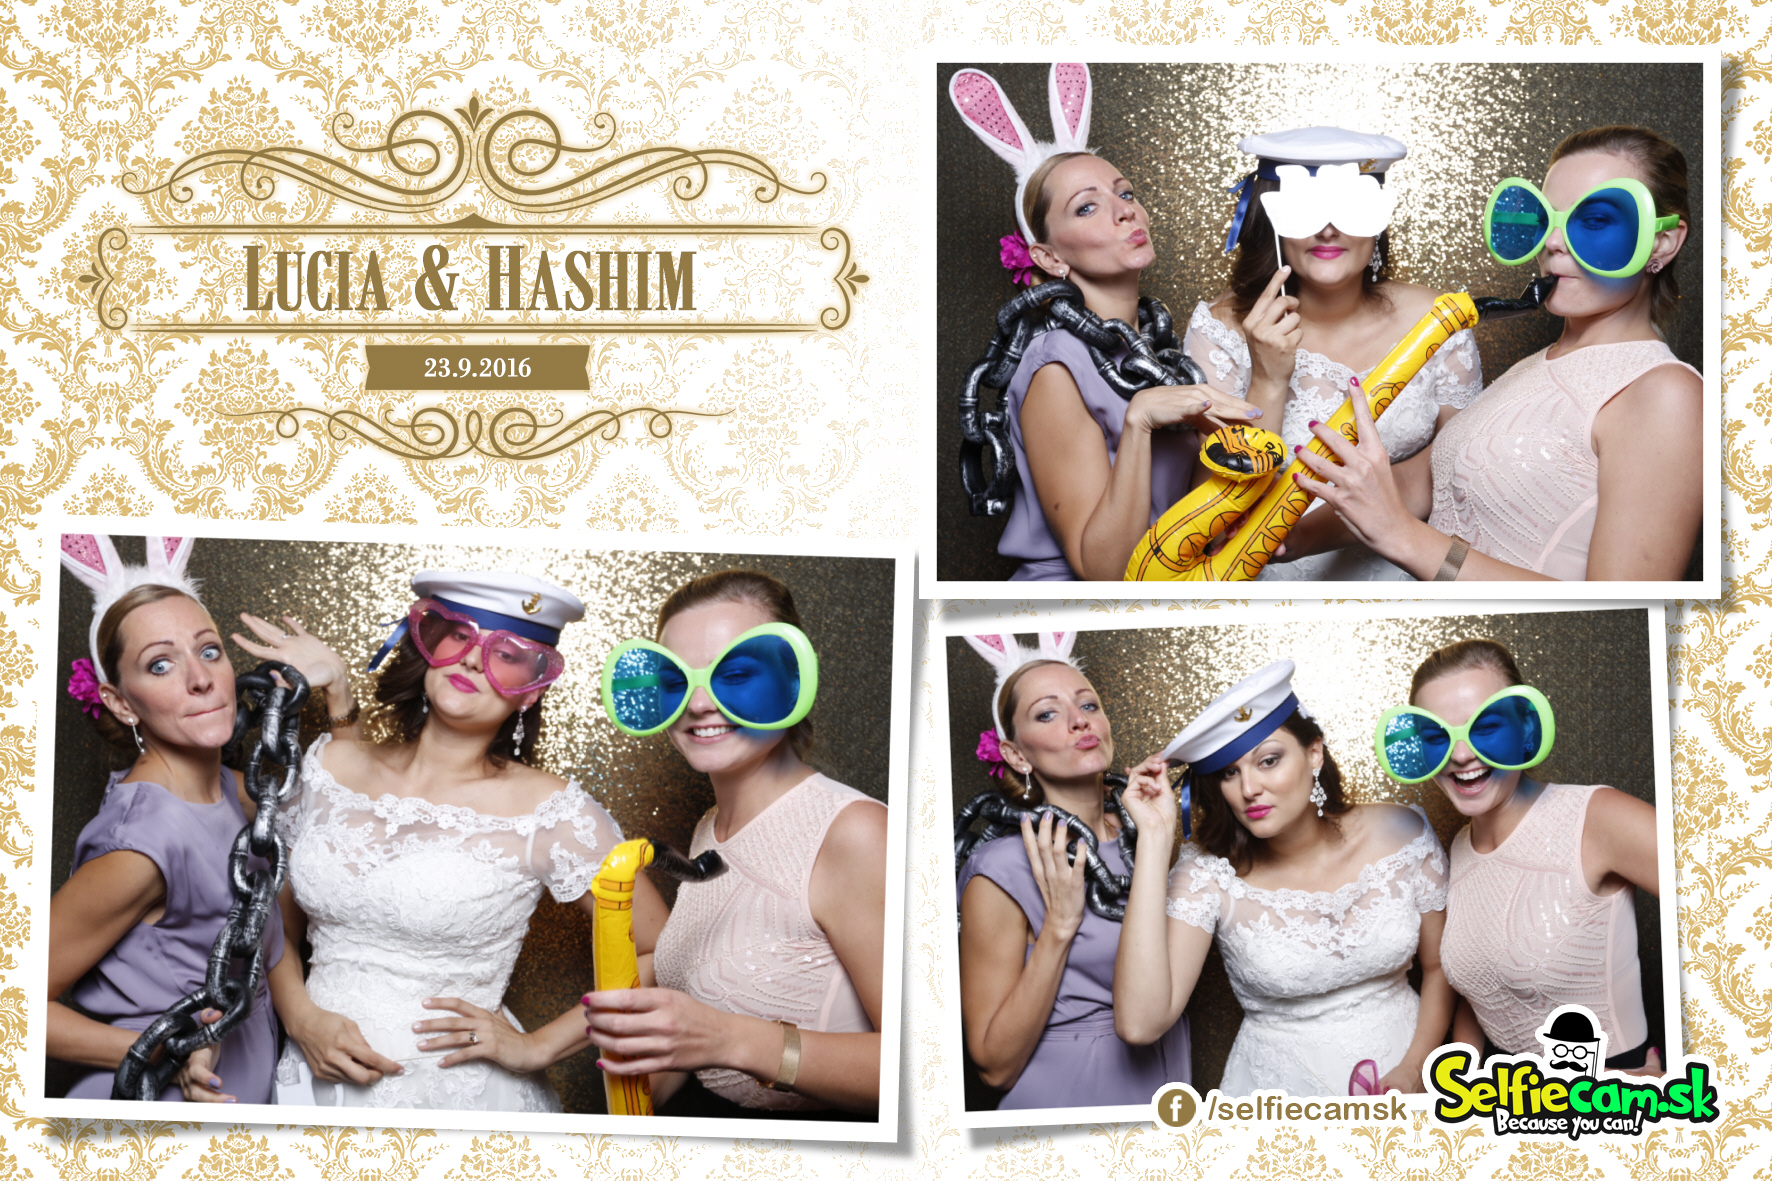 selfiecam-16-09-23-svadba-lucia-hashim-11